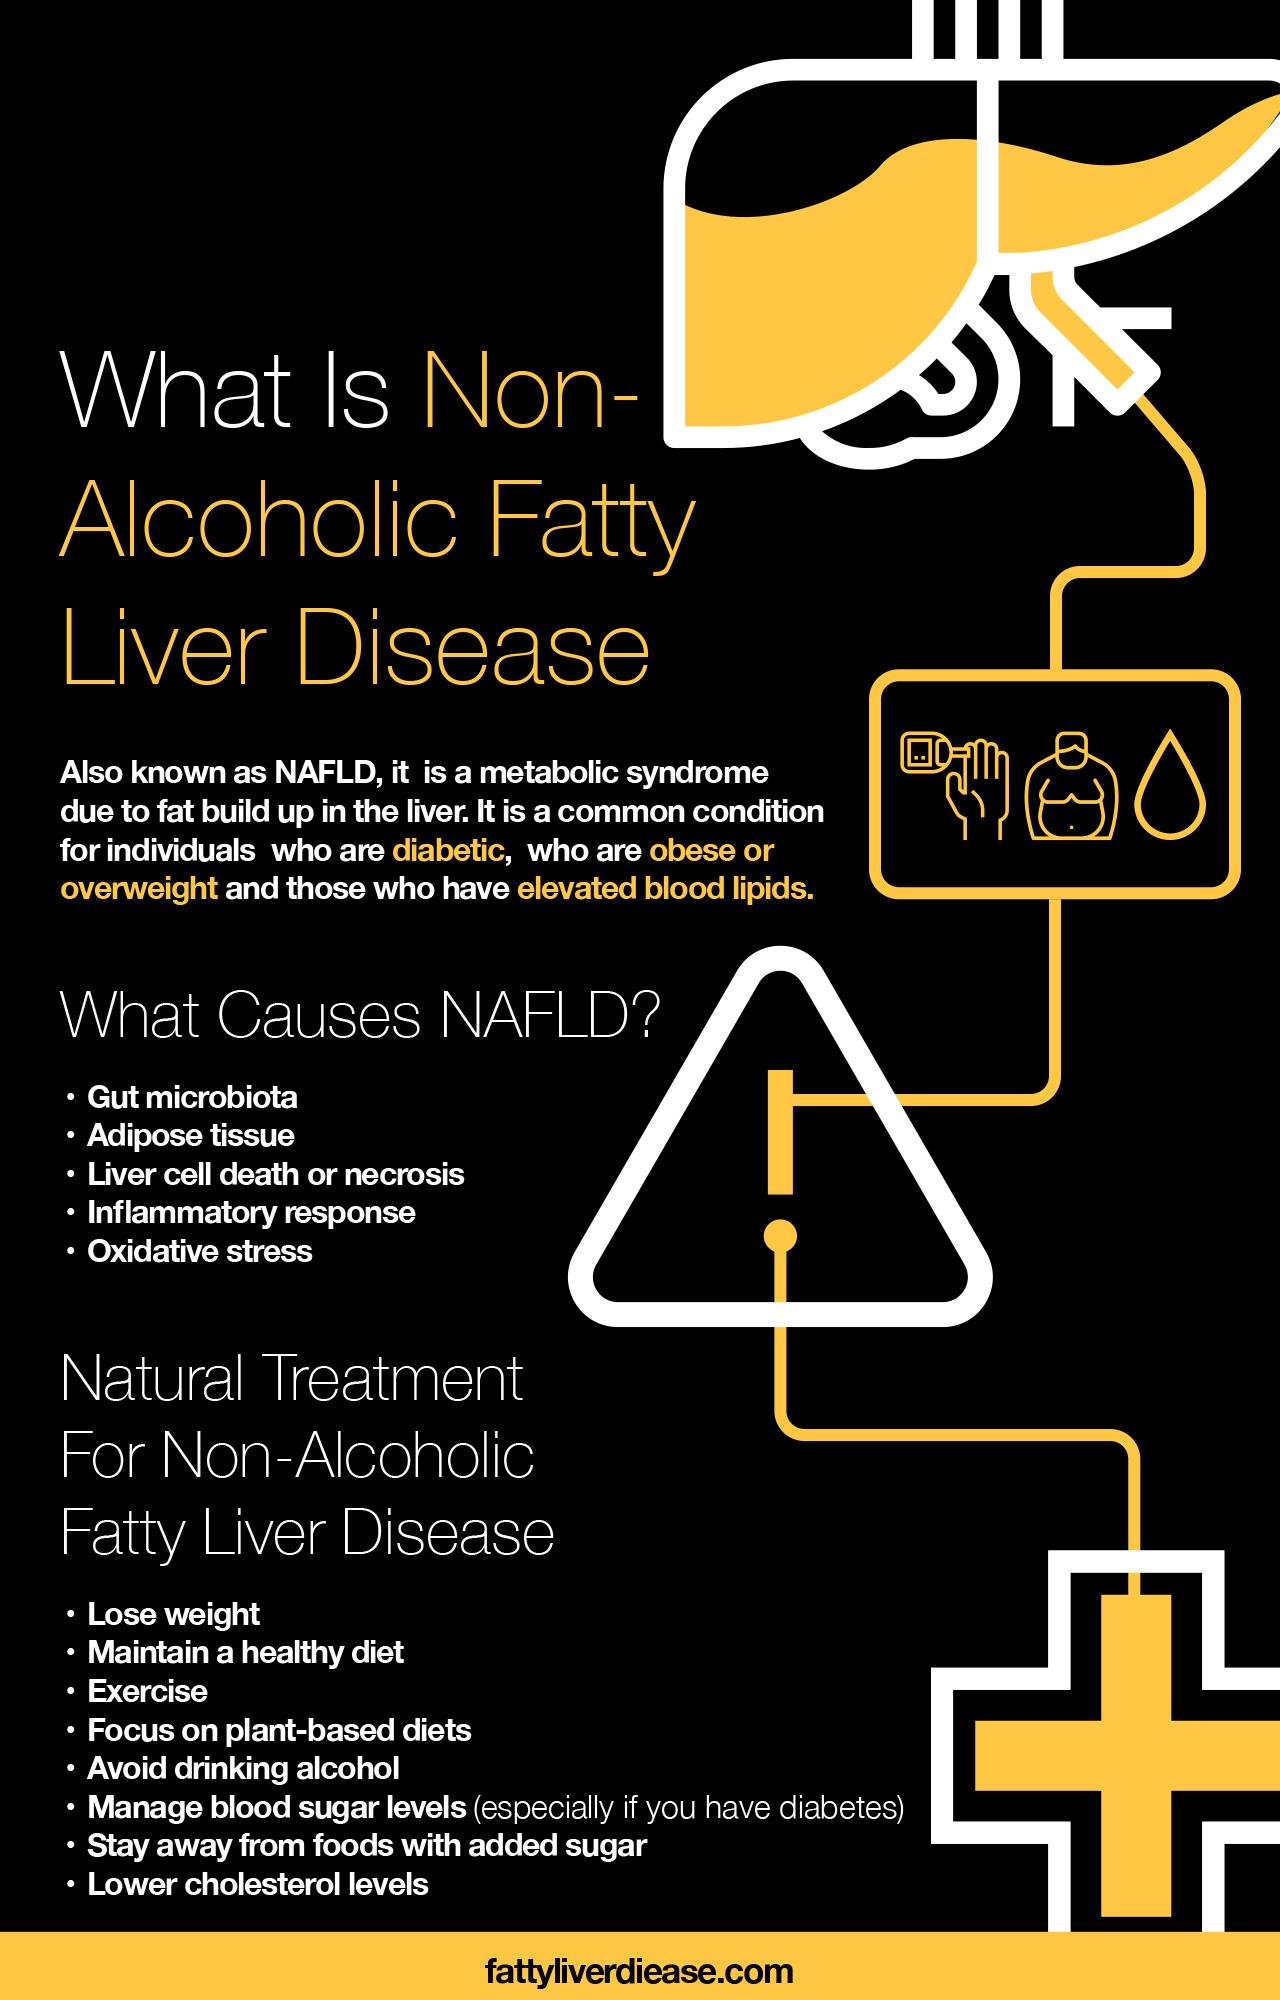 Non-Alcoholic Fatty Liver Disease Natural Treatment